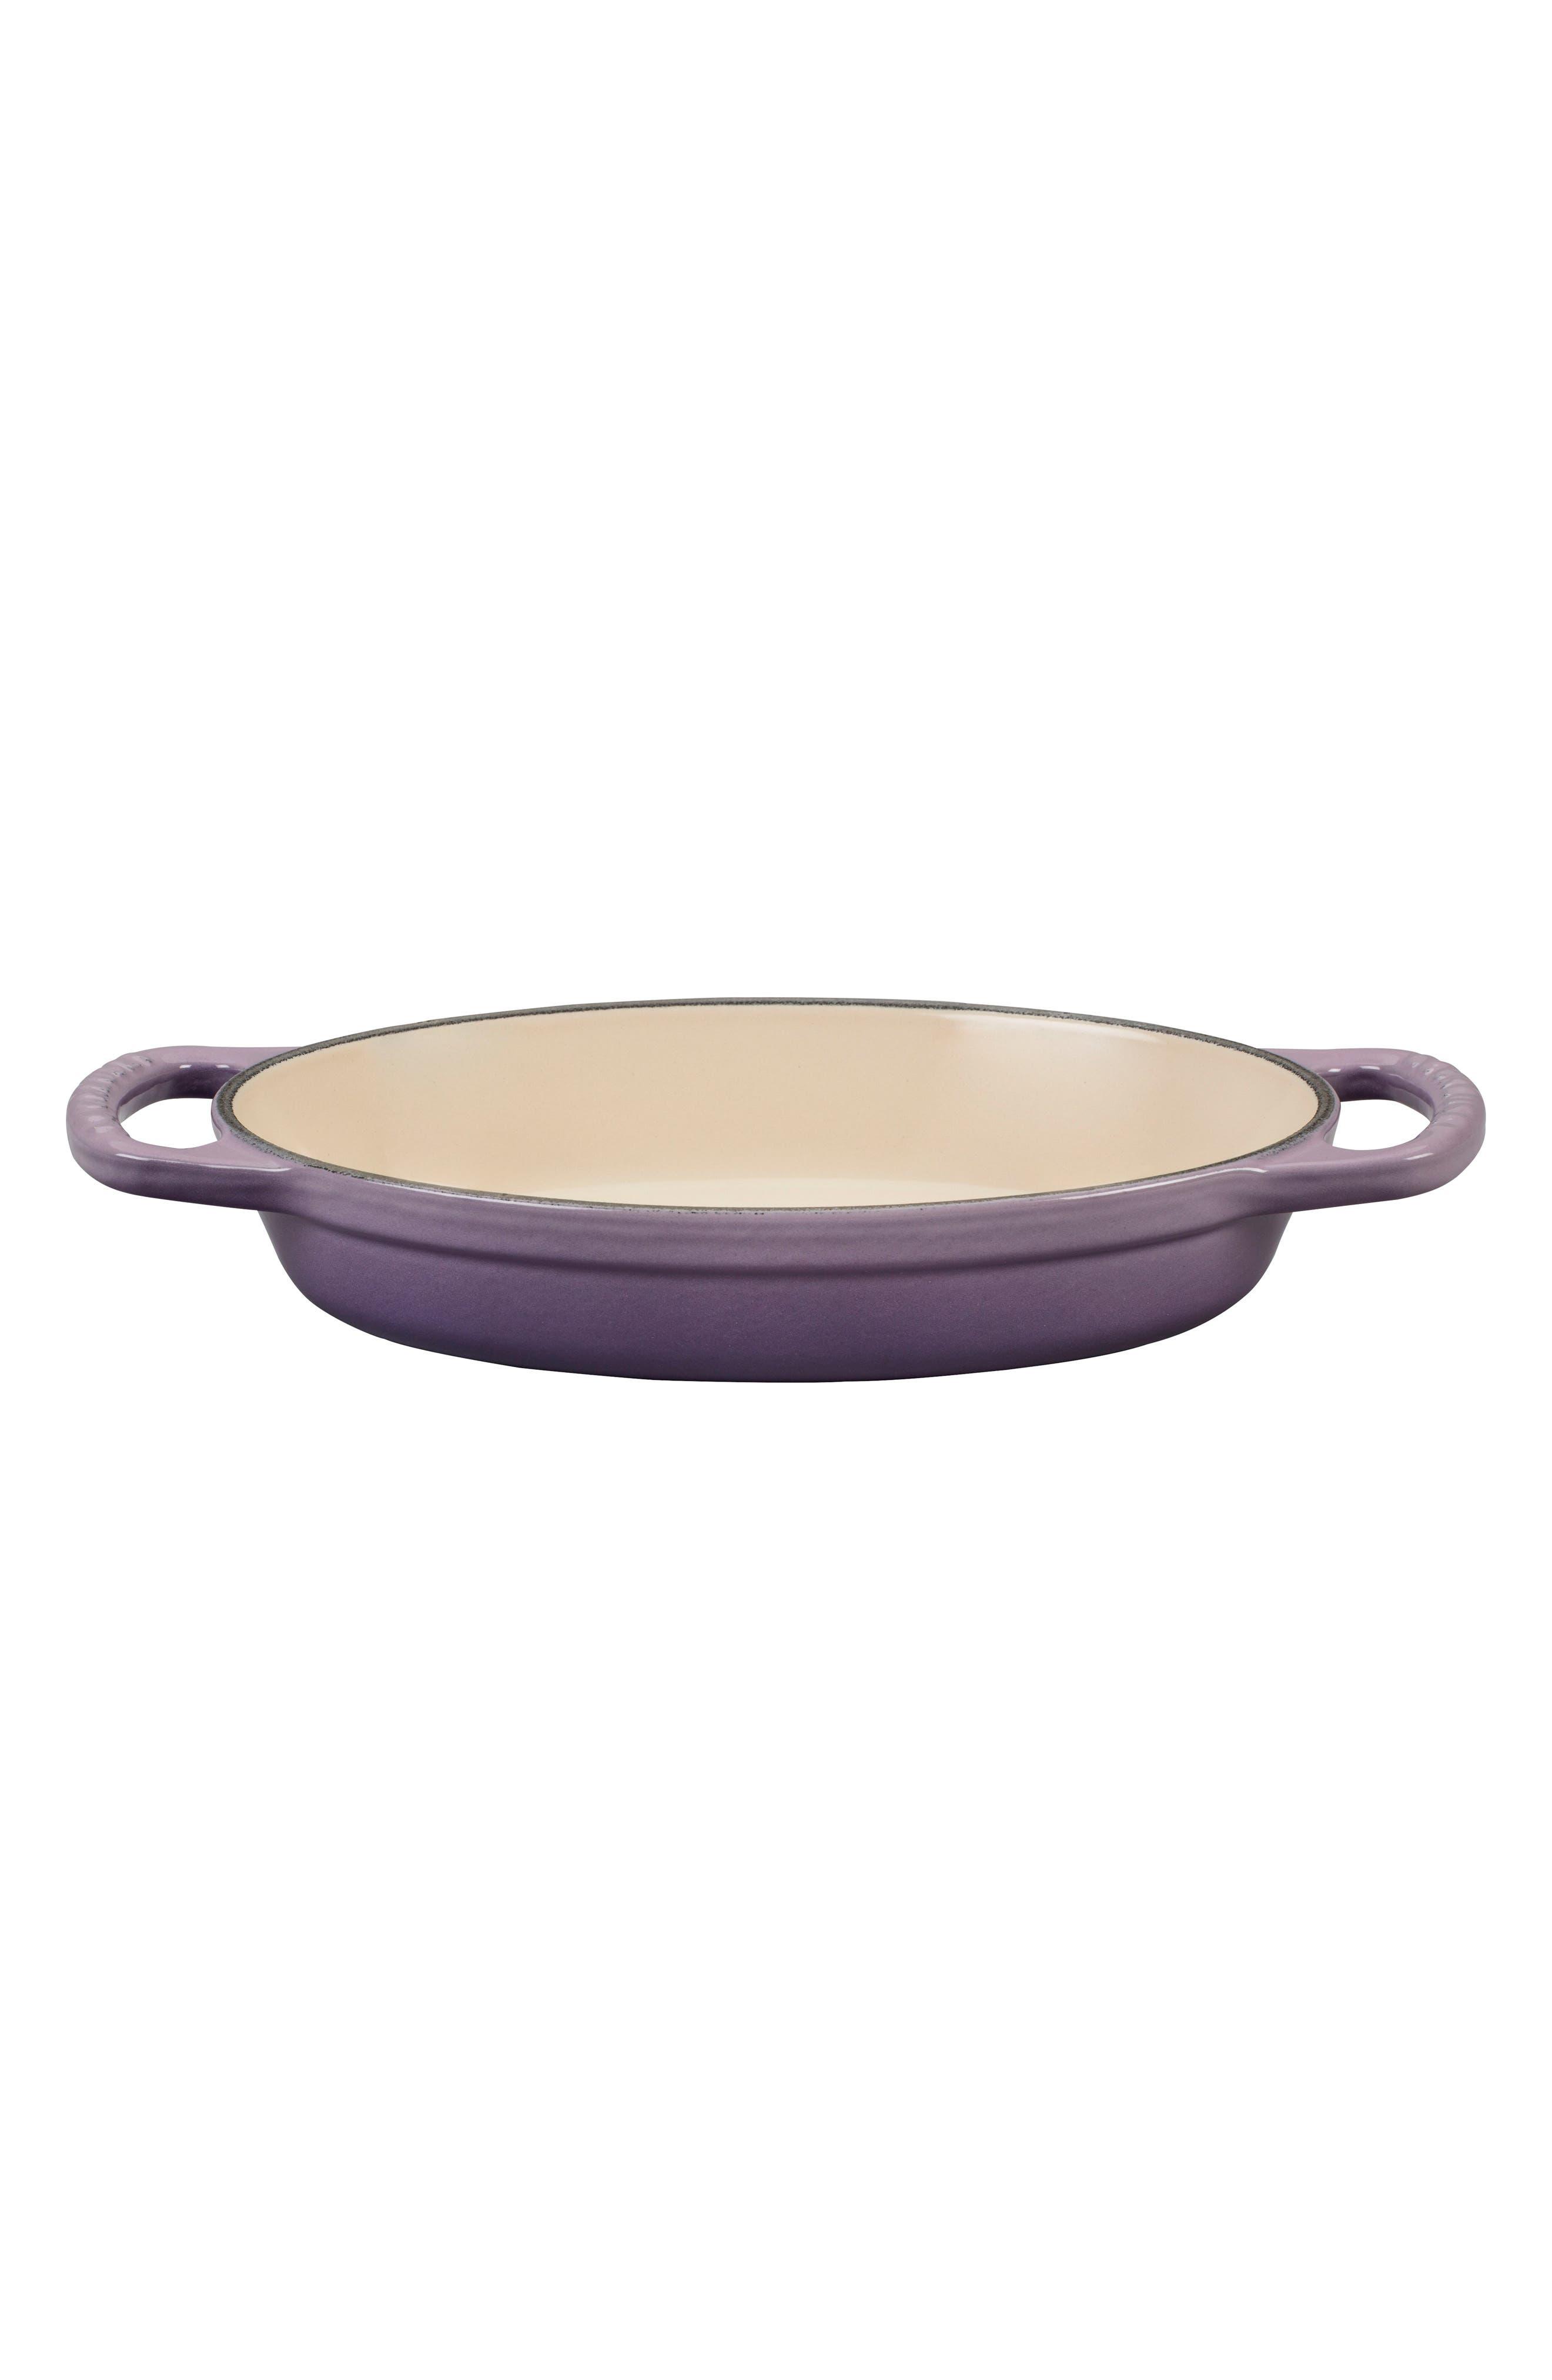 Le Creuset Signature 6-Quart Oval Baker